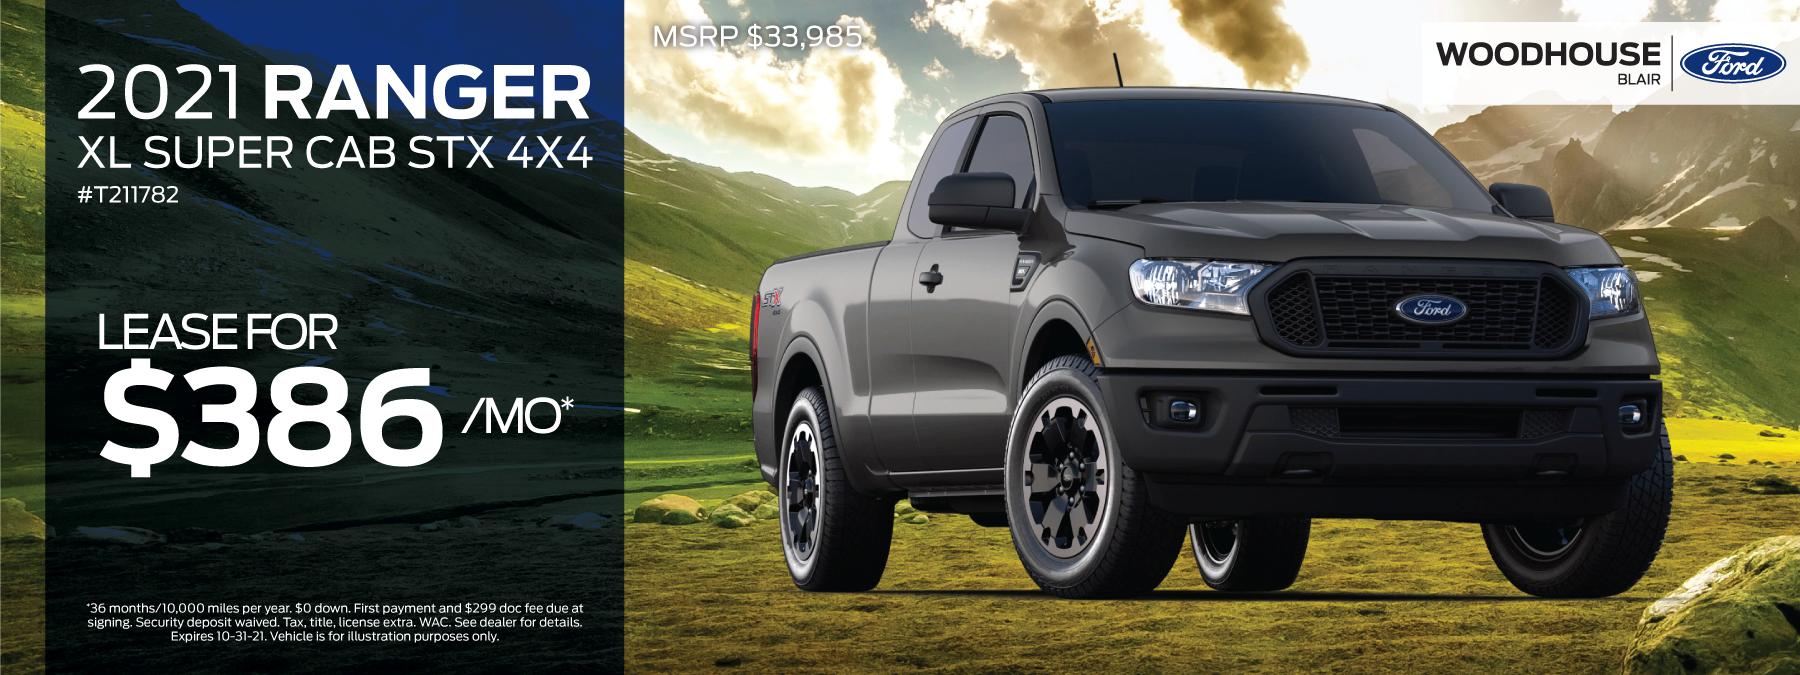 1021-Ford-BLAIR-RANGER-DESKTOP